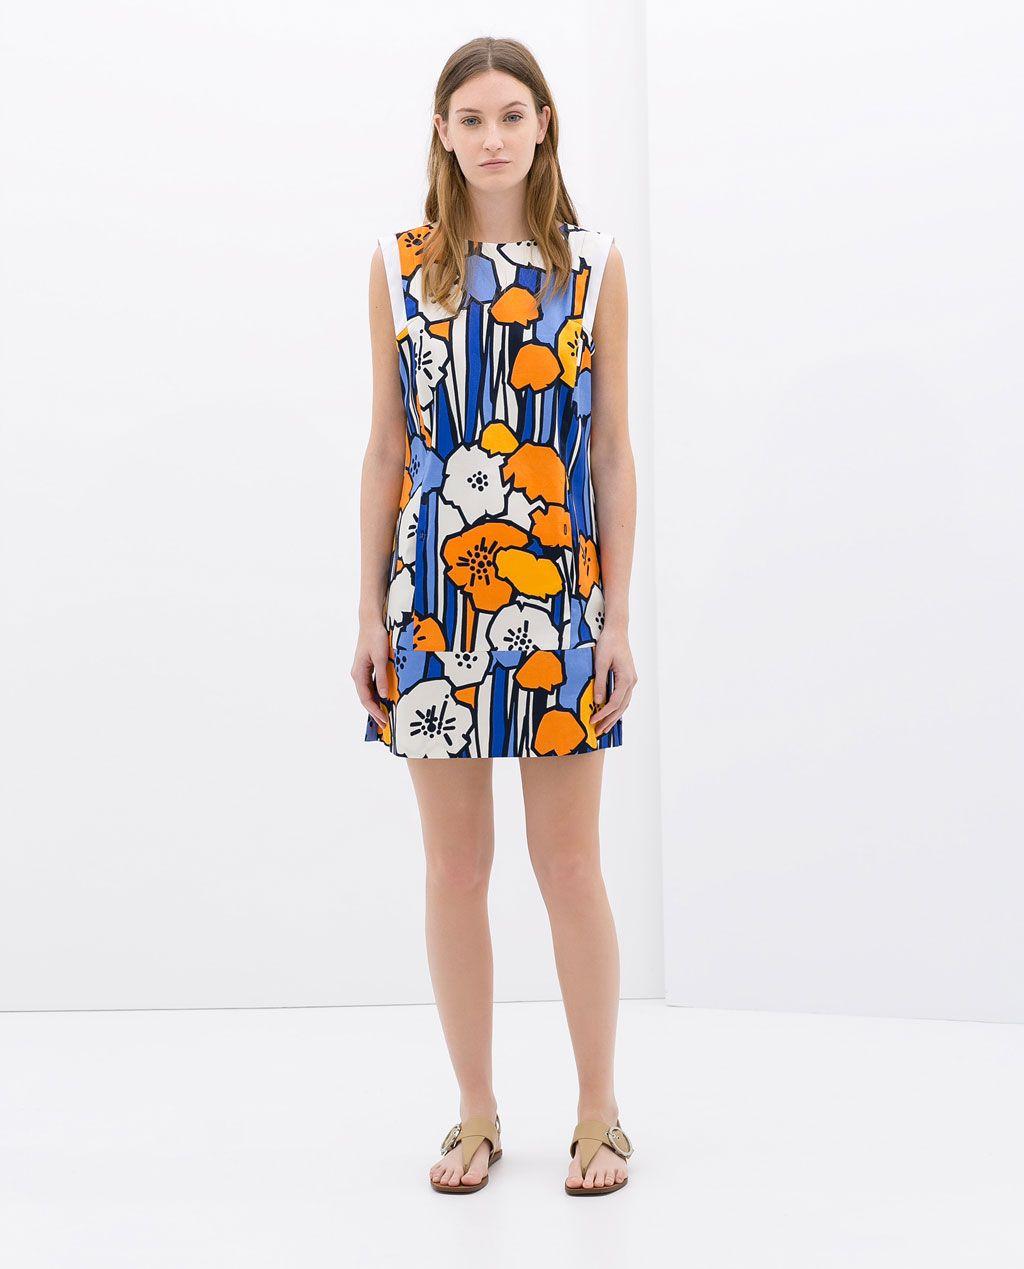 Vestido azul flores naranjas zara